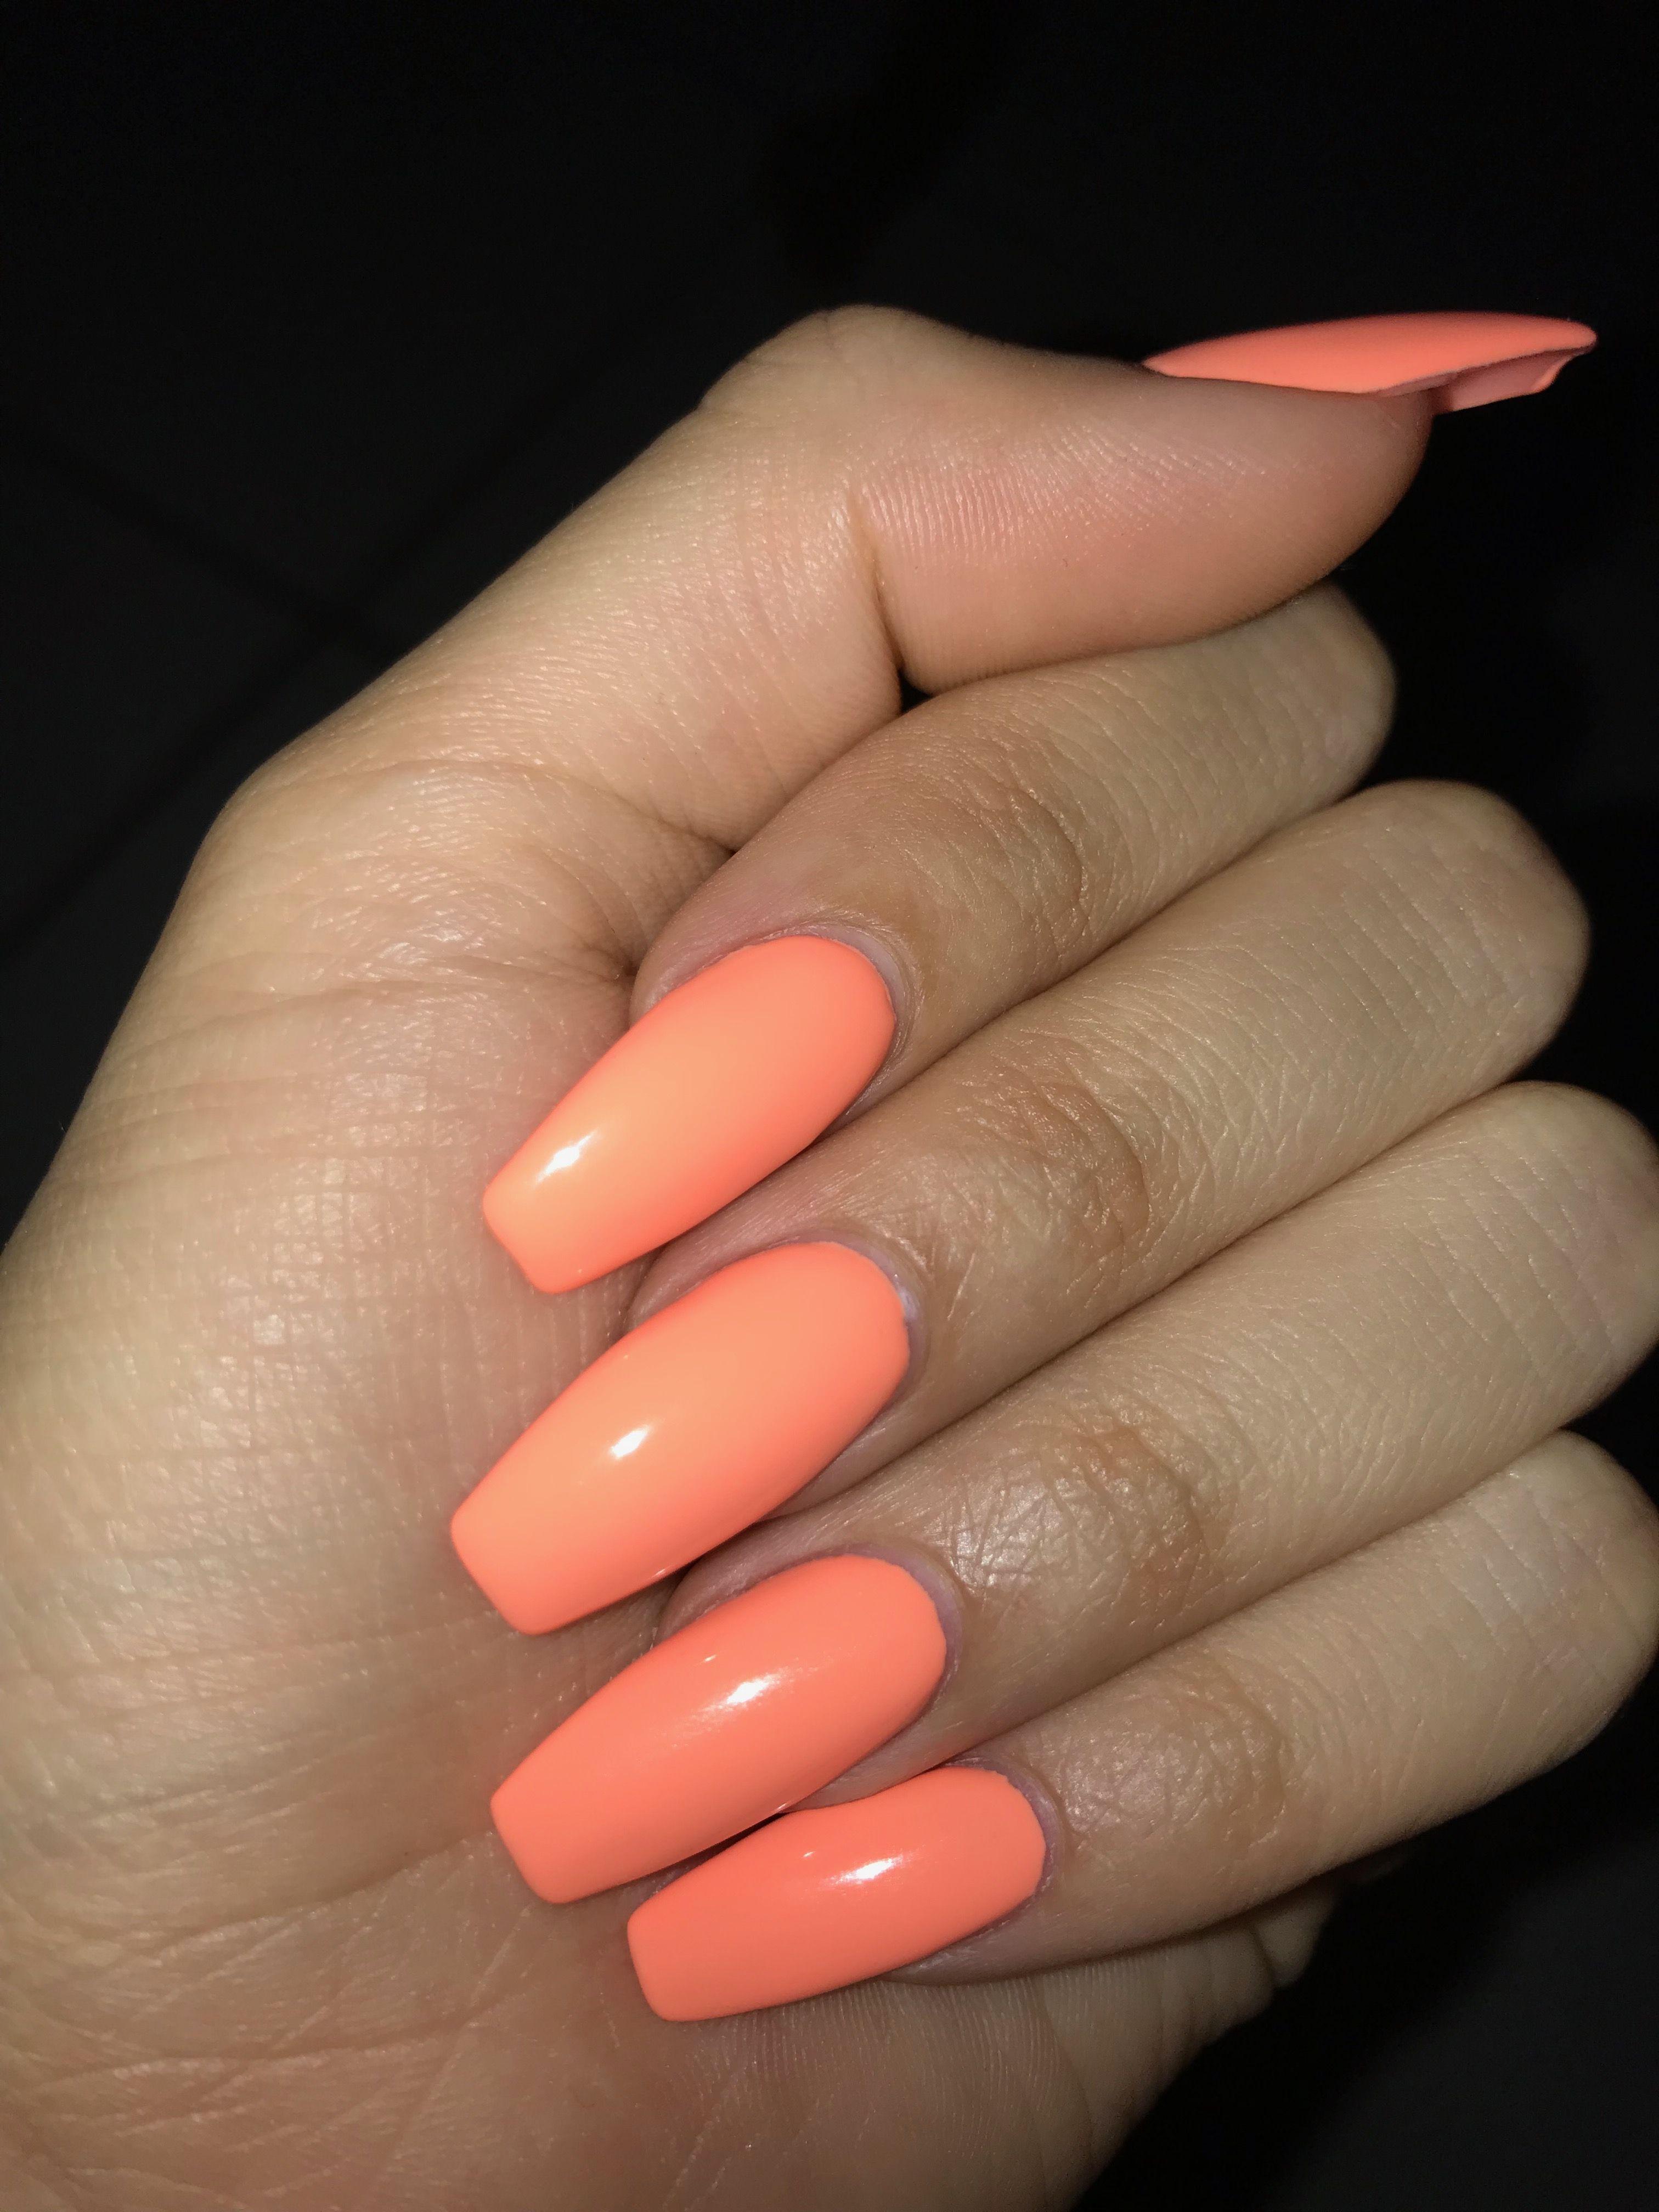 coffin peach acrylic nails photo - 2